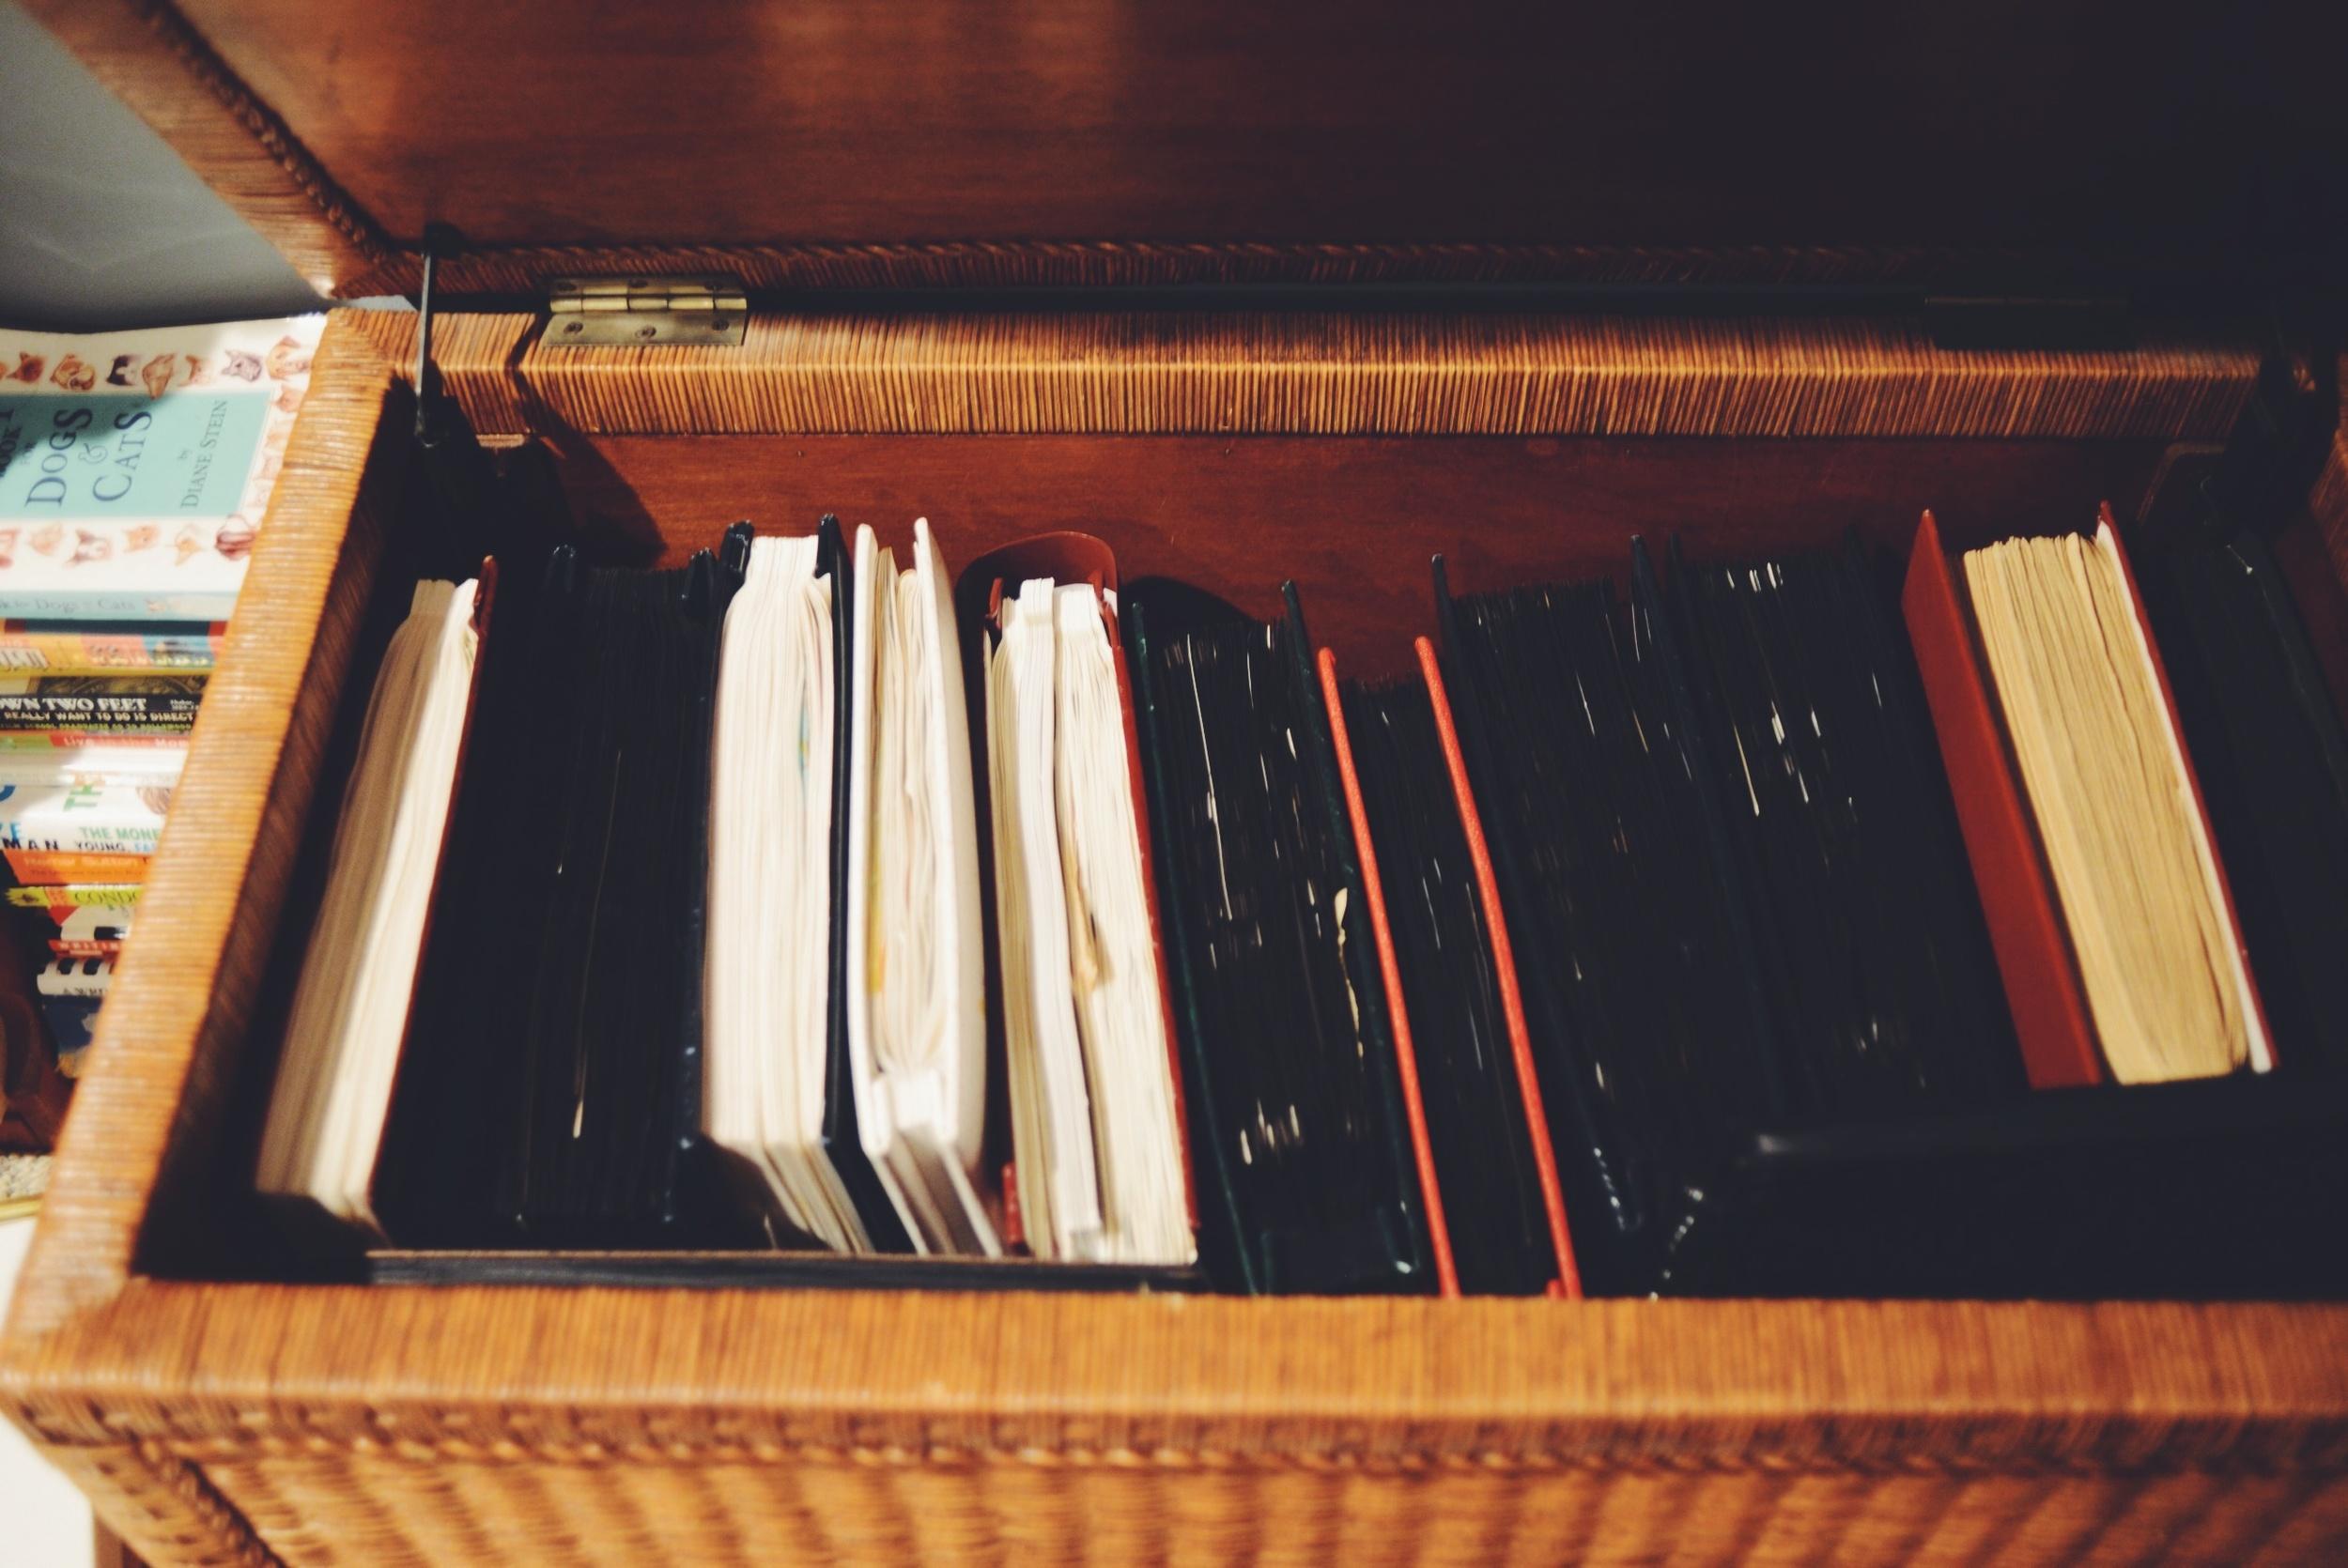 All my old scrapbooks